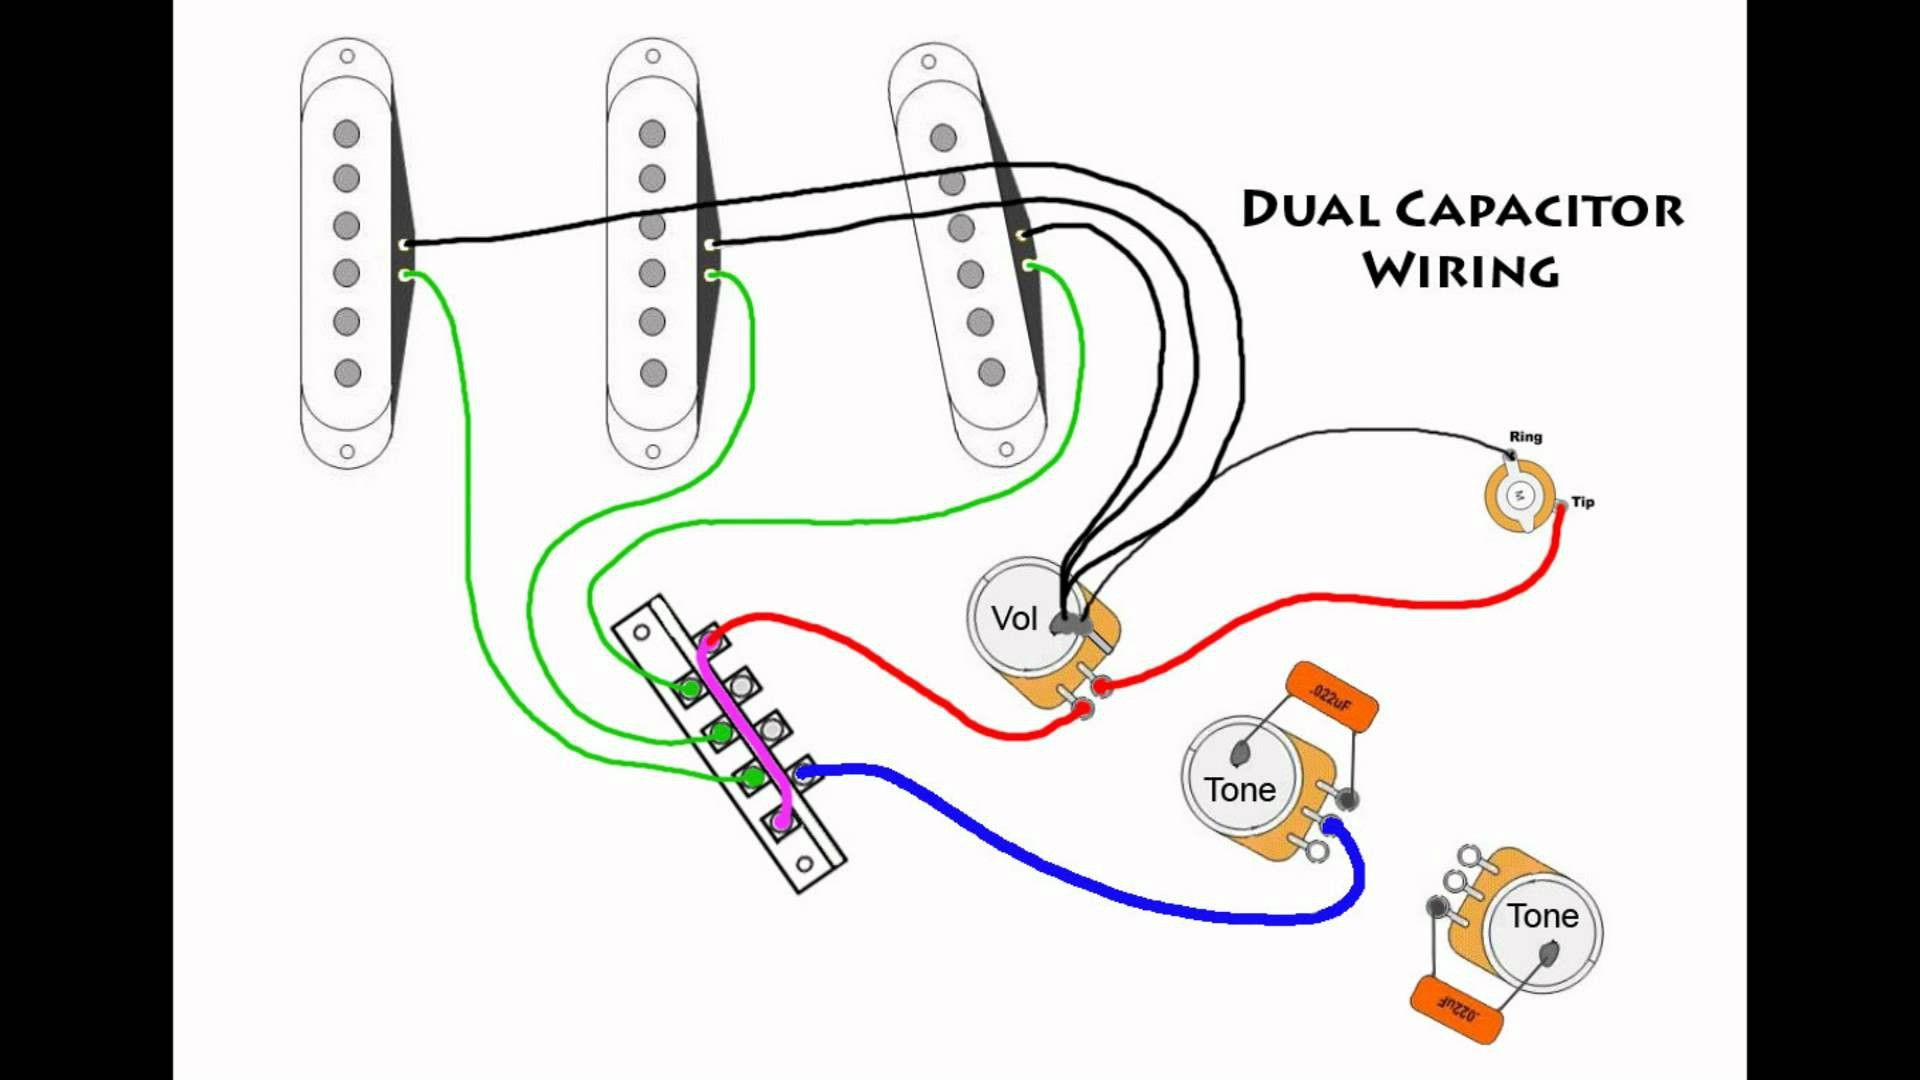 Superb Schematic Of A Fender Stratocaster Wiring Diagram Wiring Diagram Wiring Cloud Hemtshollocom